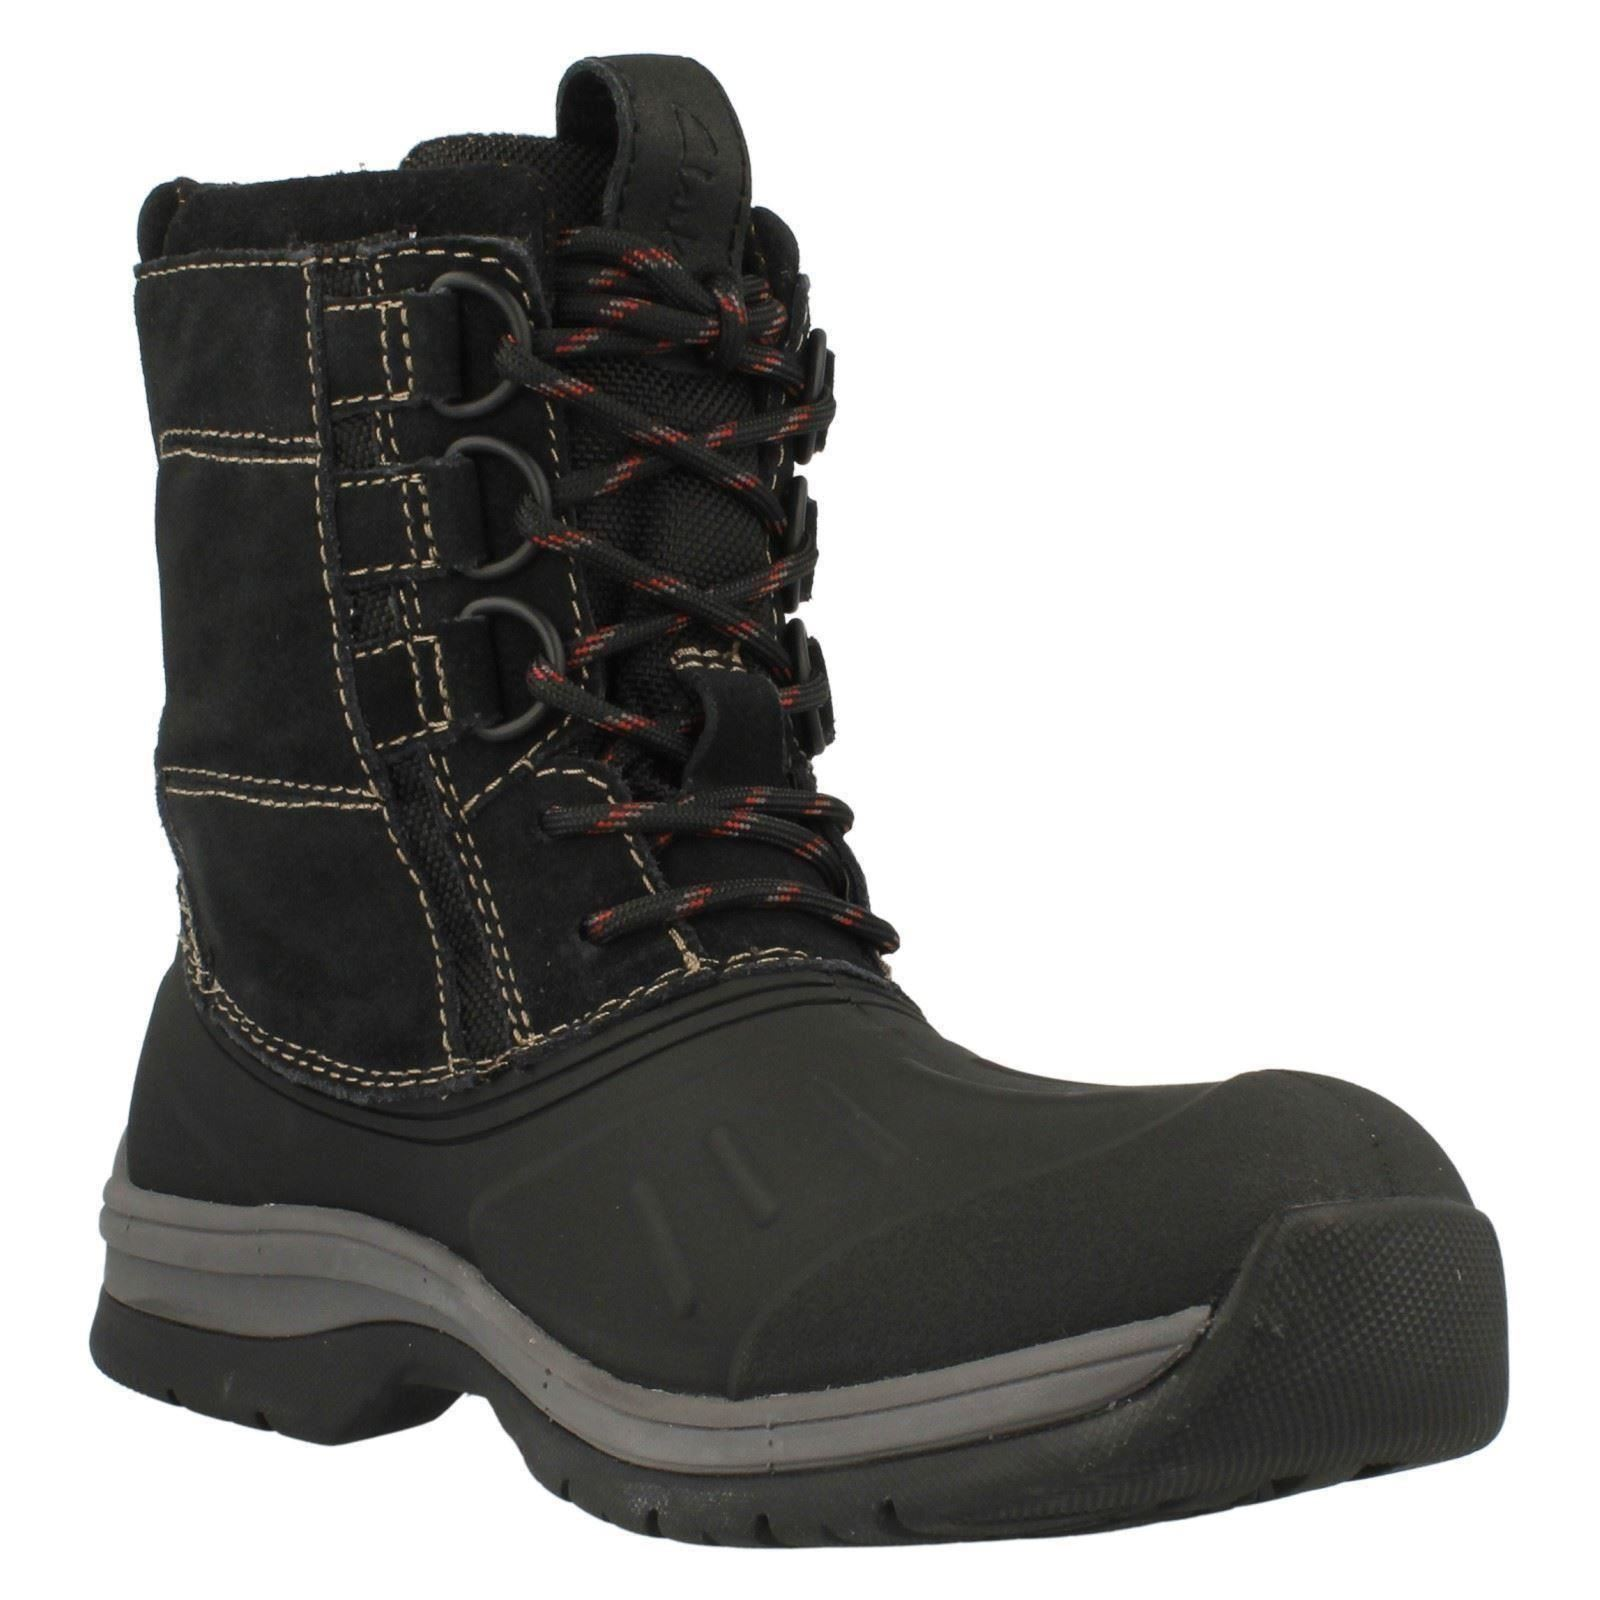 Mens-Clarks-Outdoor-Boots-Nashoba-Summit thumbnail 5